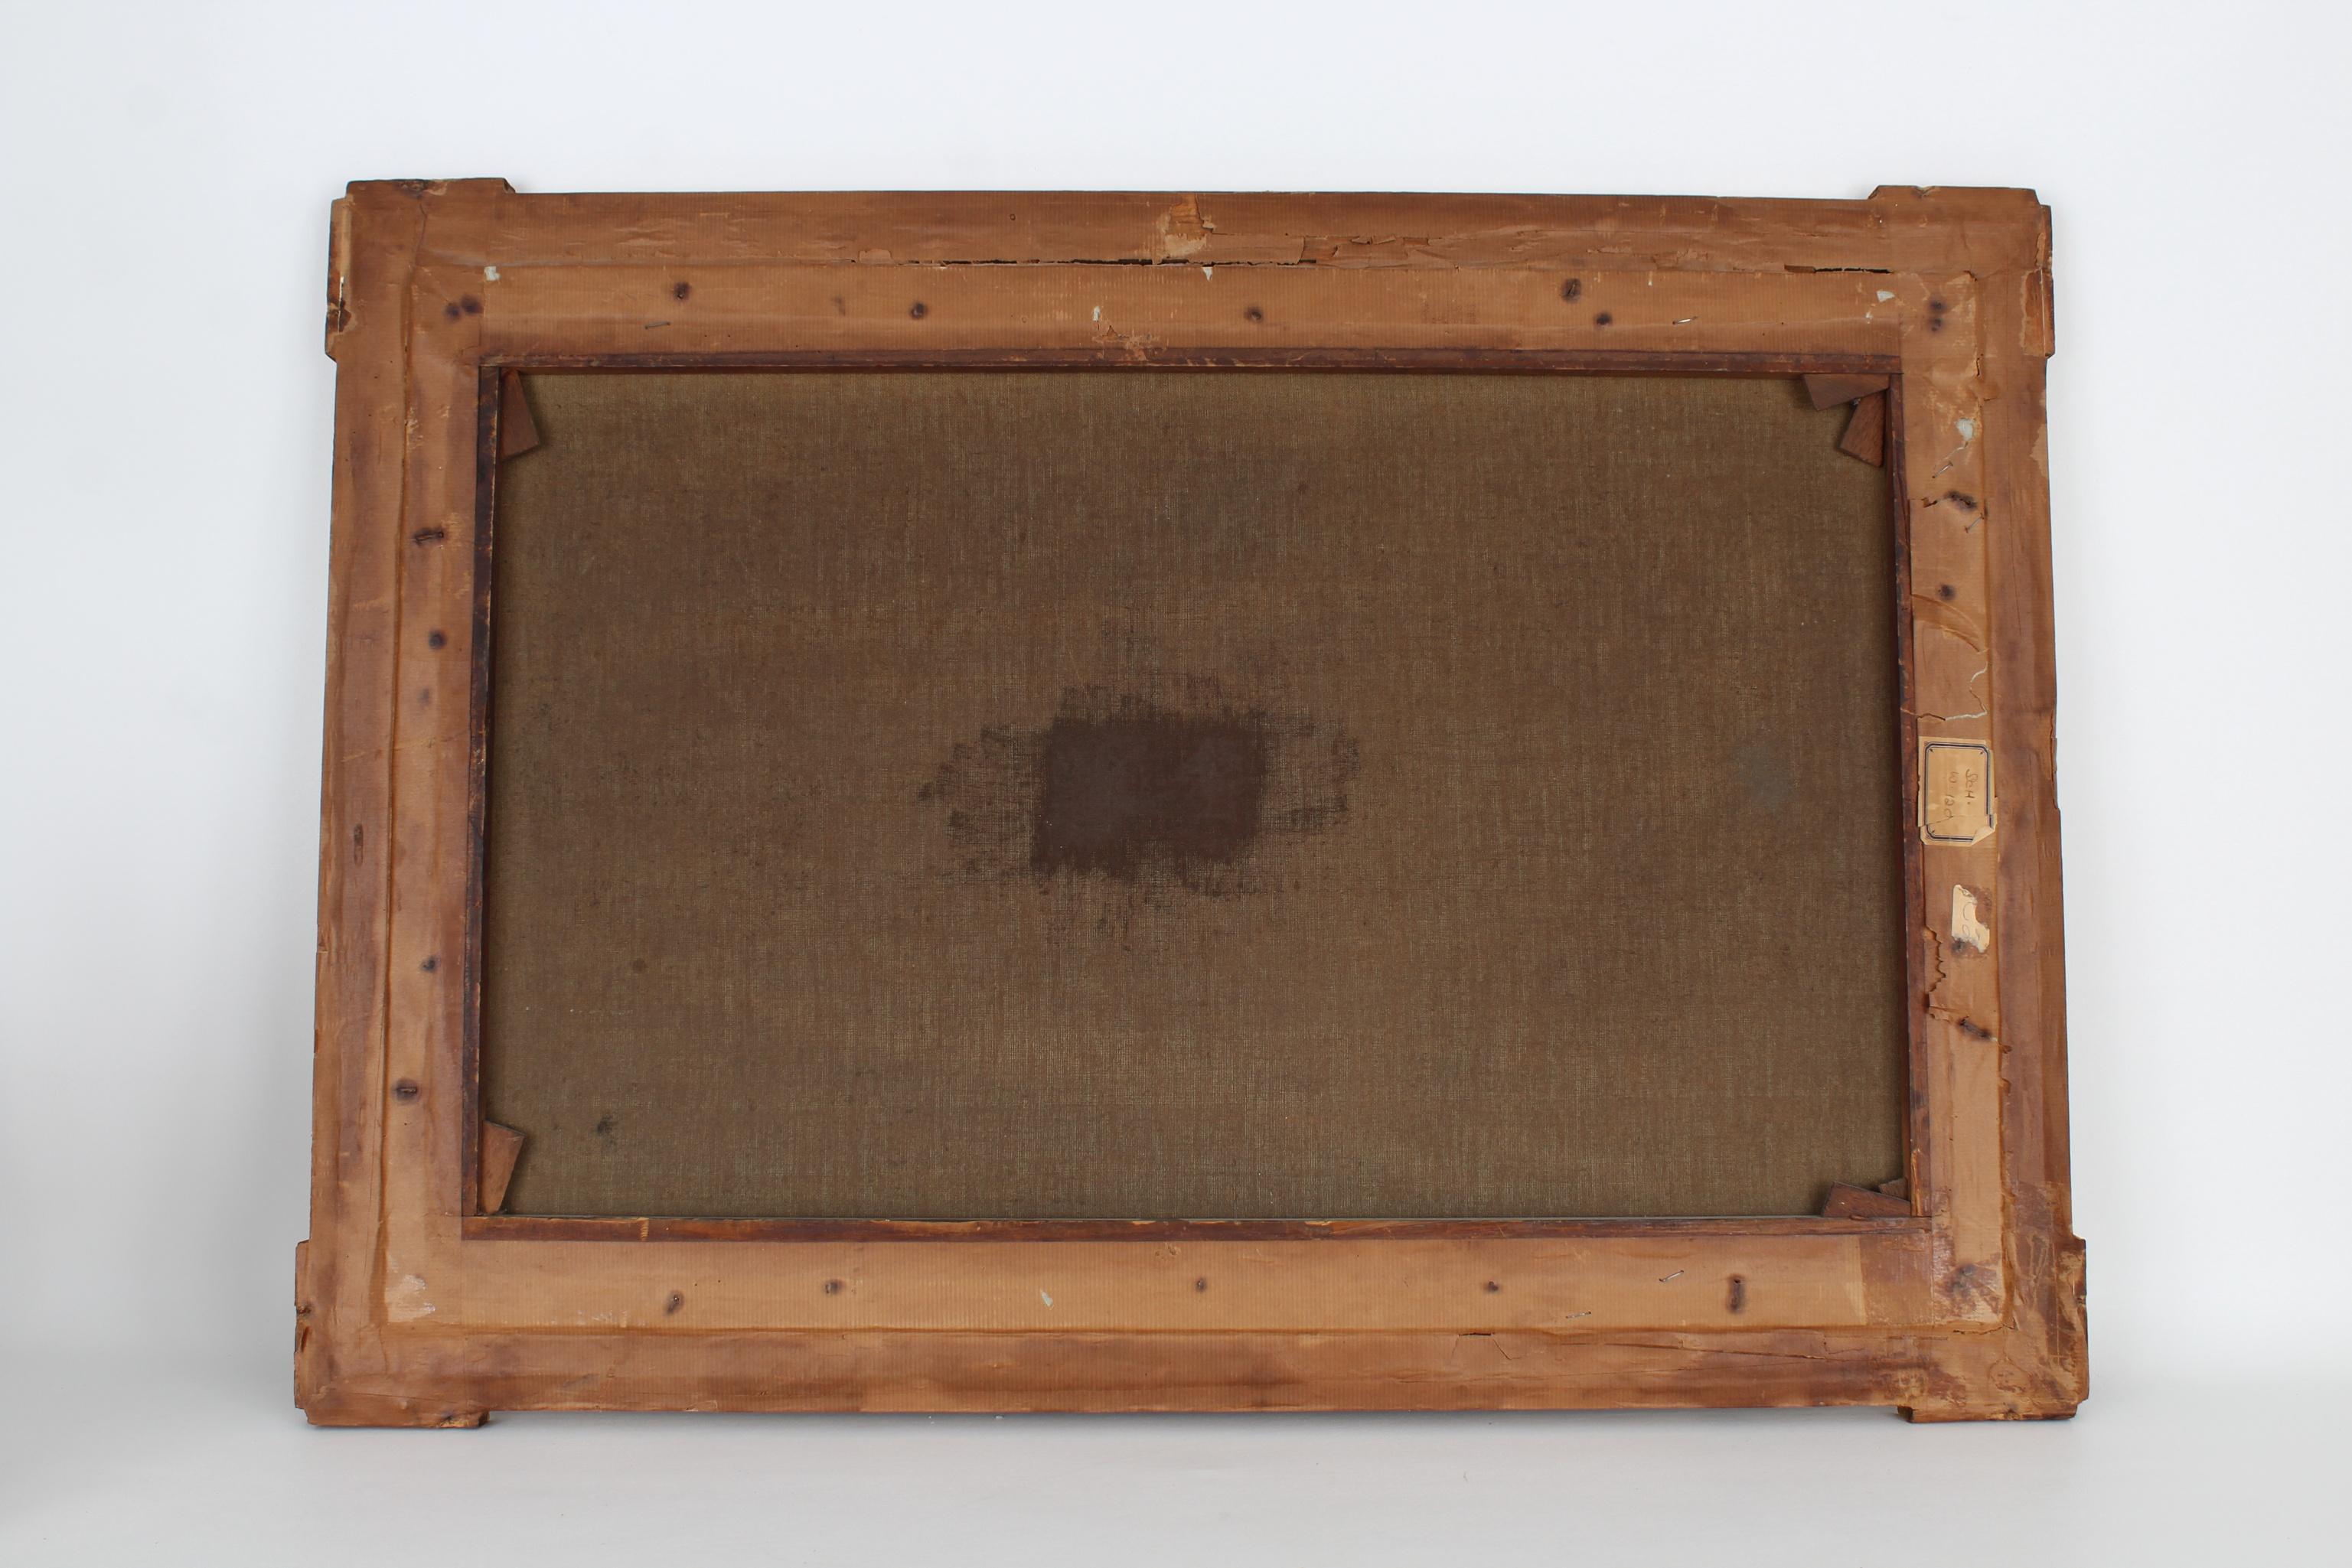 Attr. Theodore Rousseau (1812 - 1867) Barbizon - Image 5 of 6